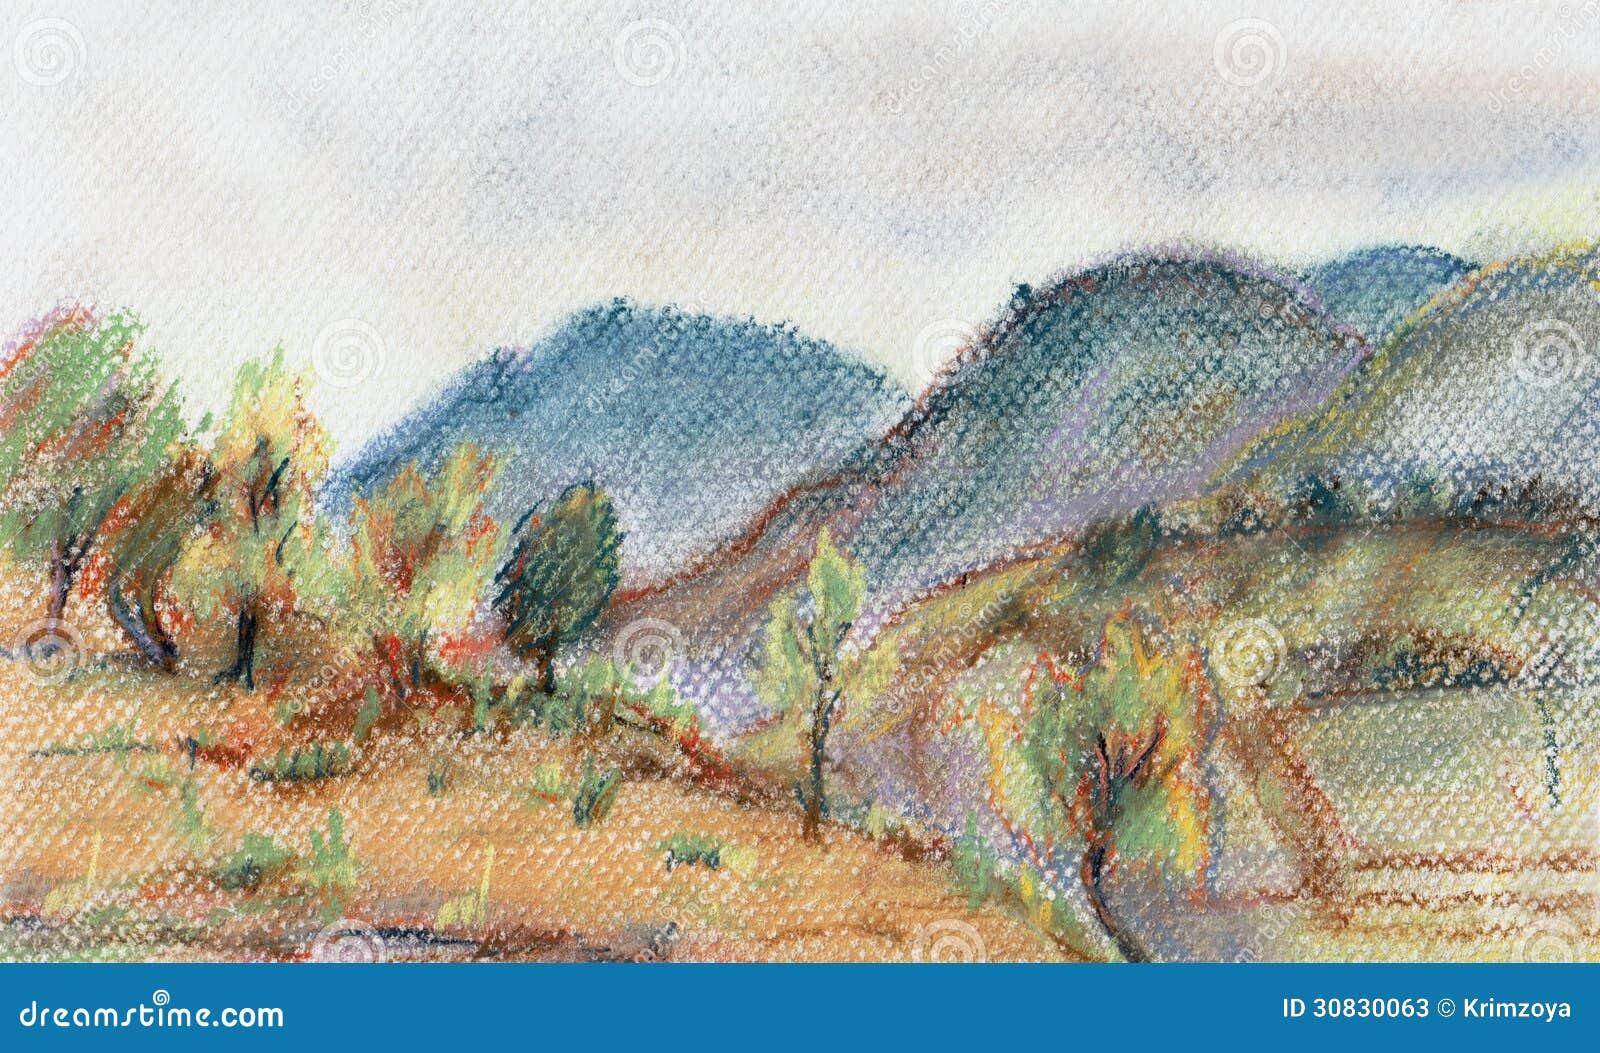 Montagne basse in Erge